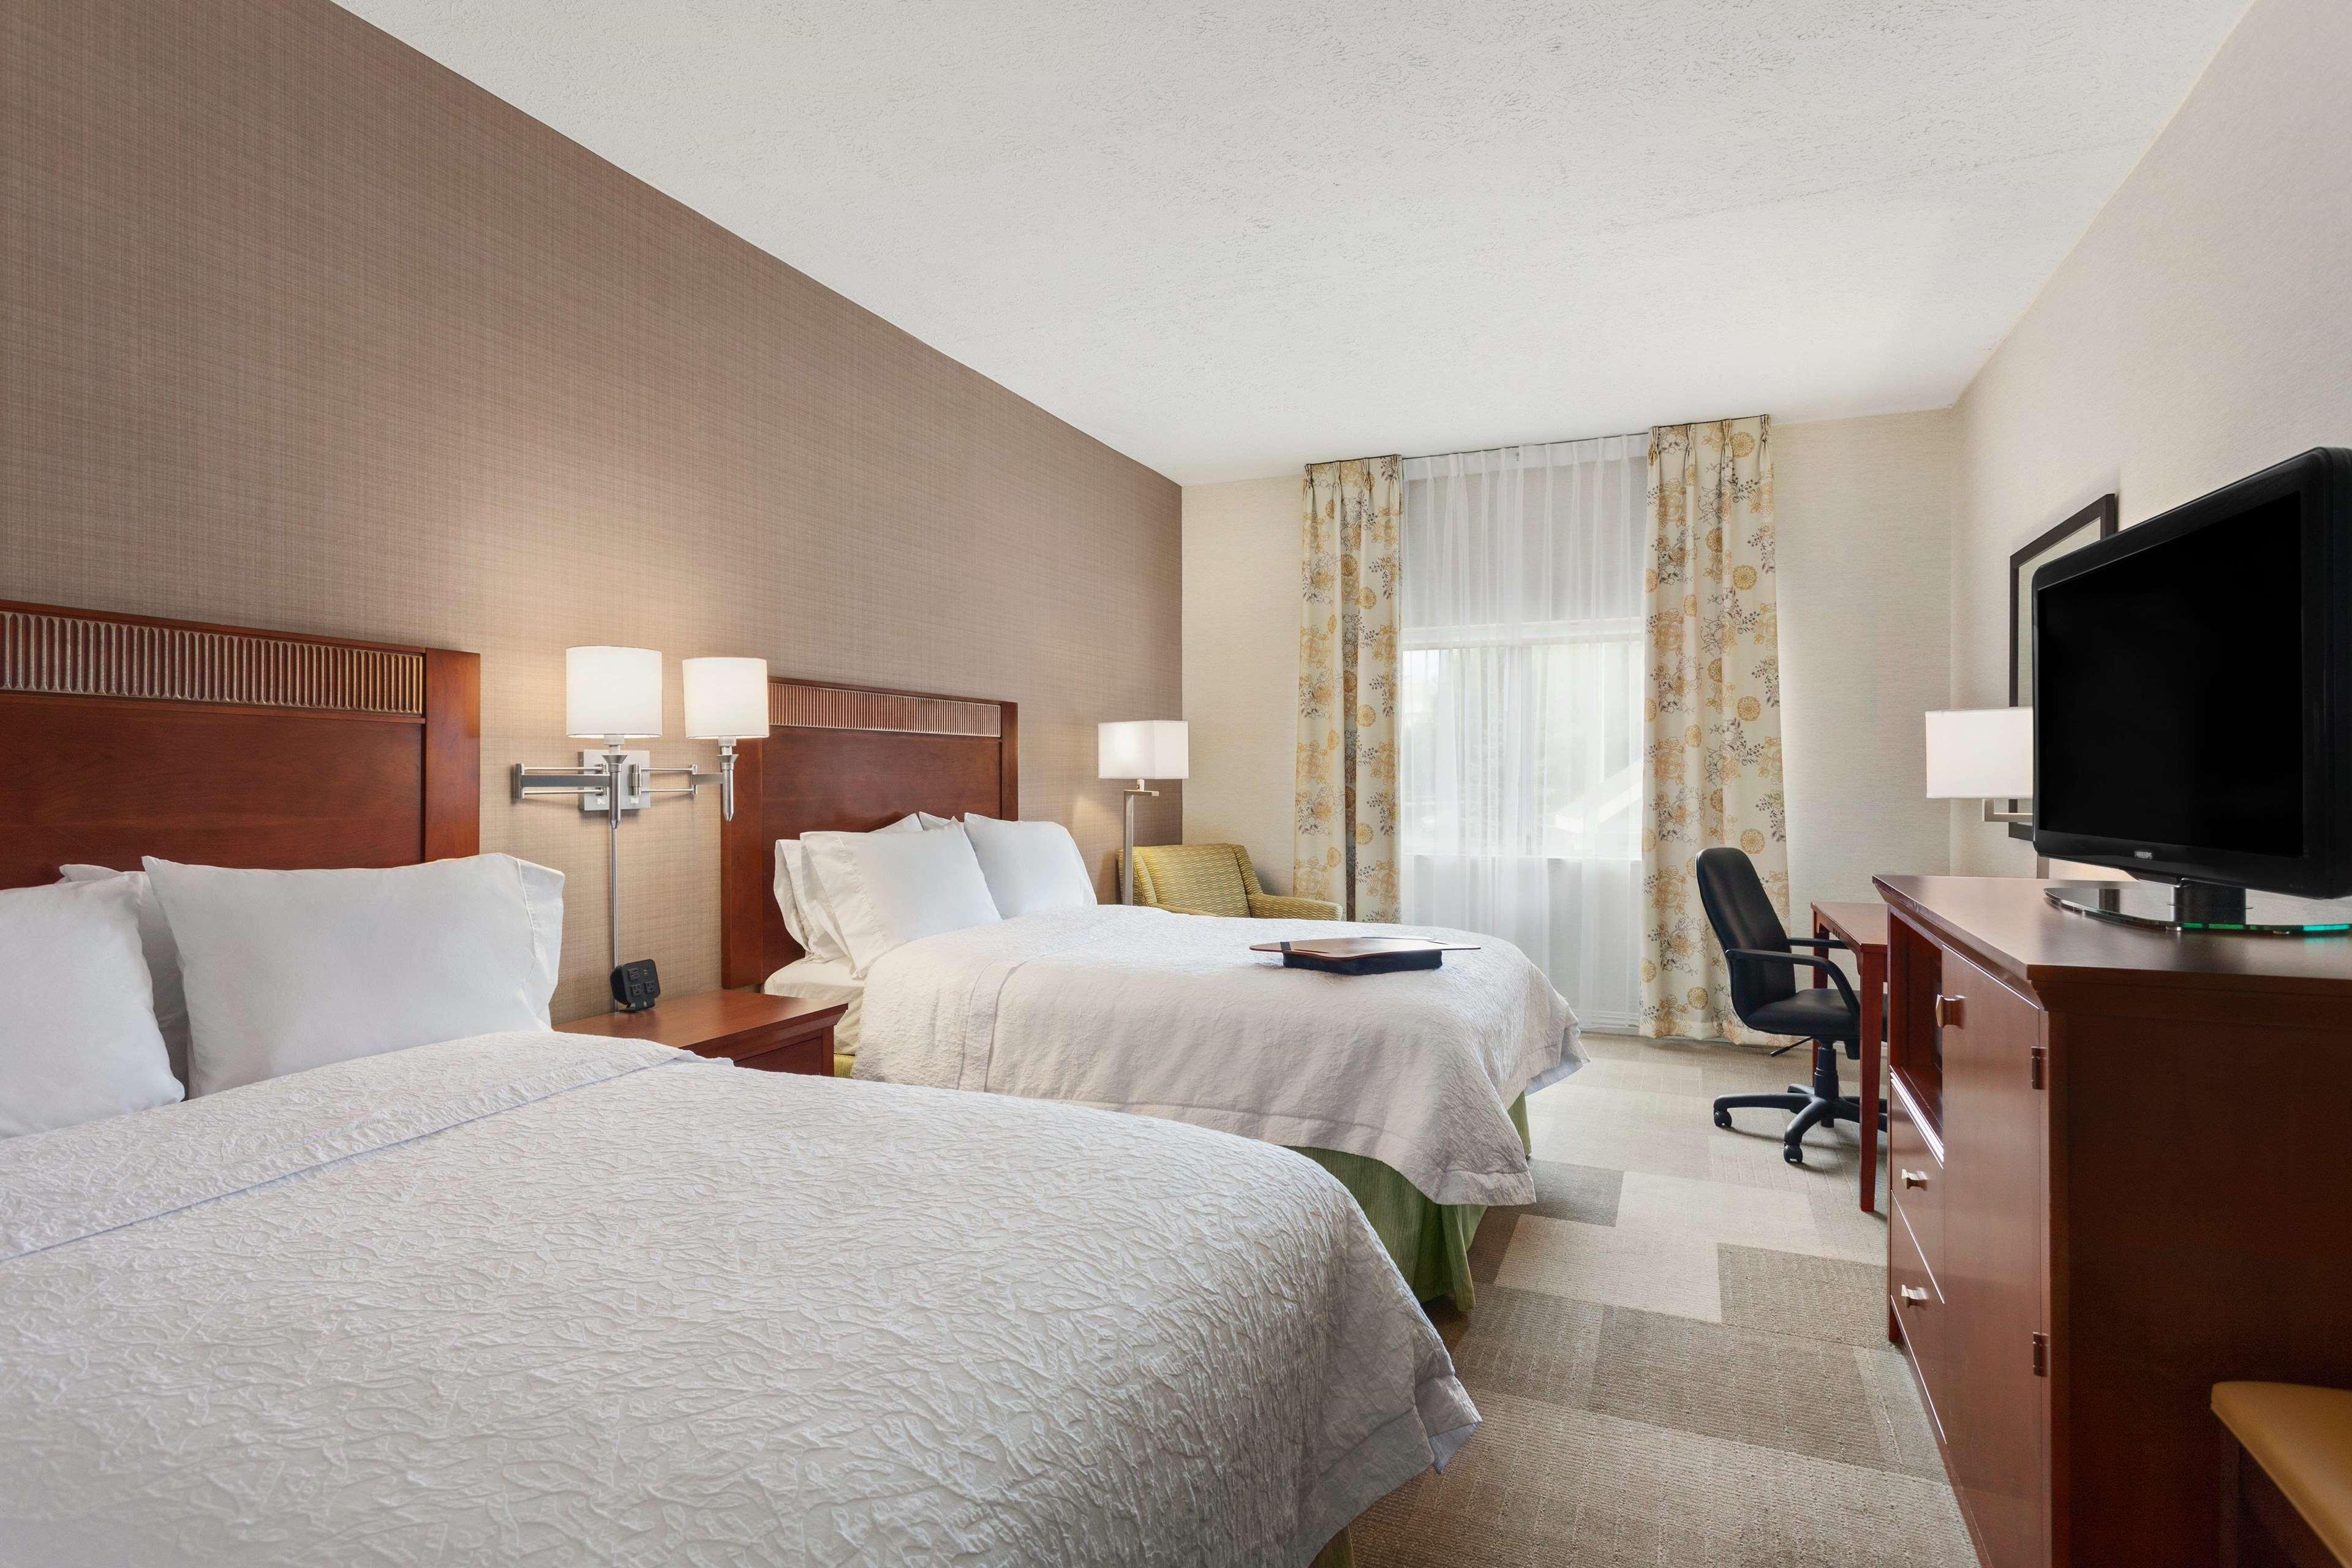 Hampton Inn by Hilton Colchester